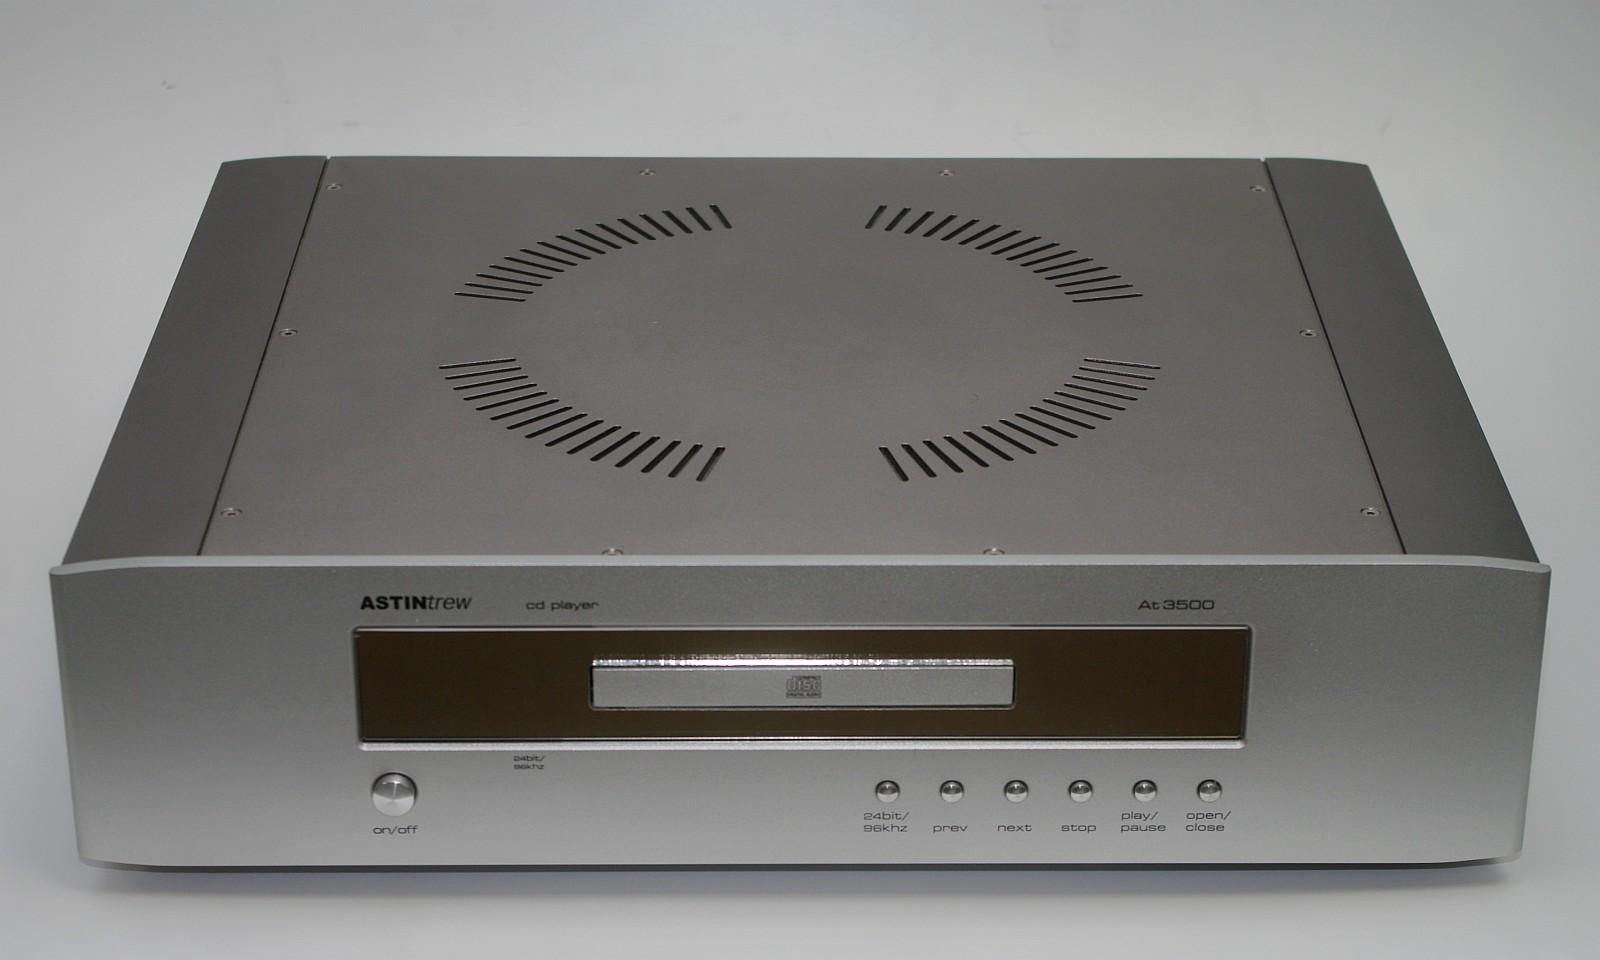 AstinTrew AT3500